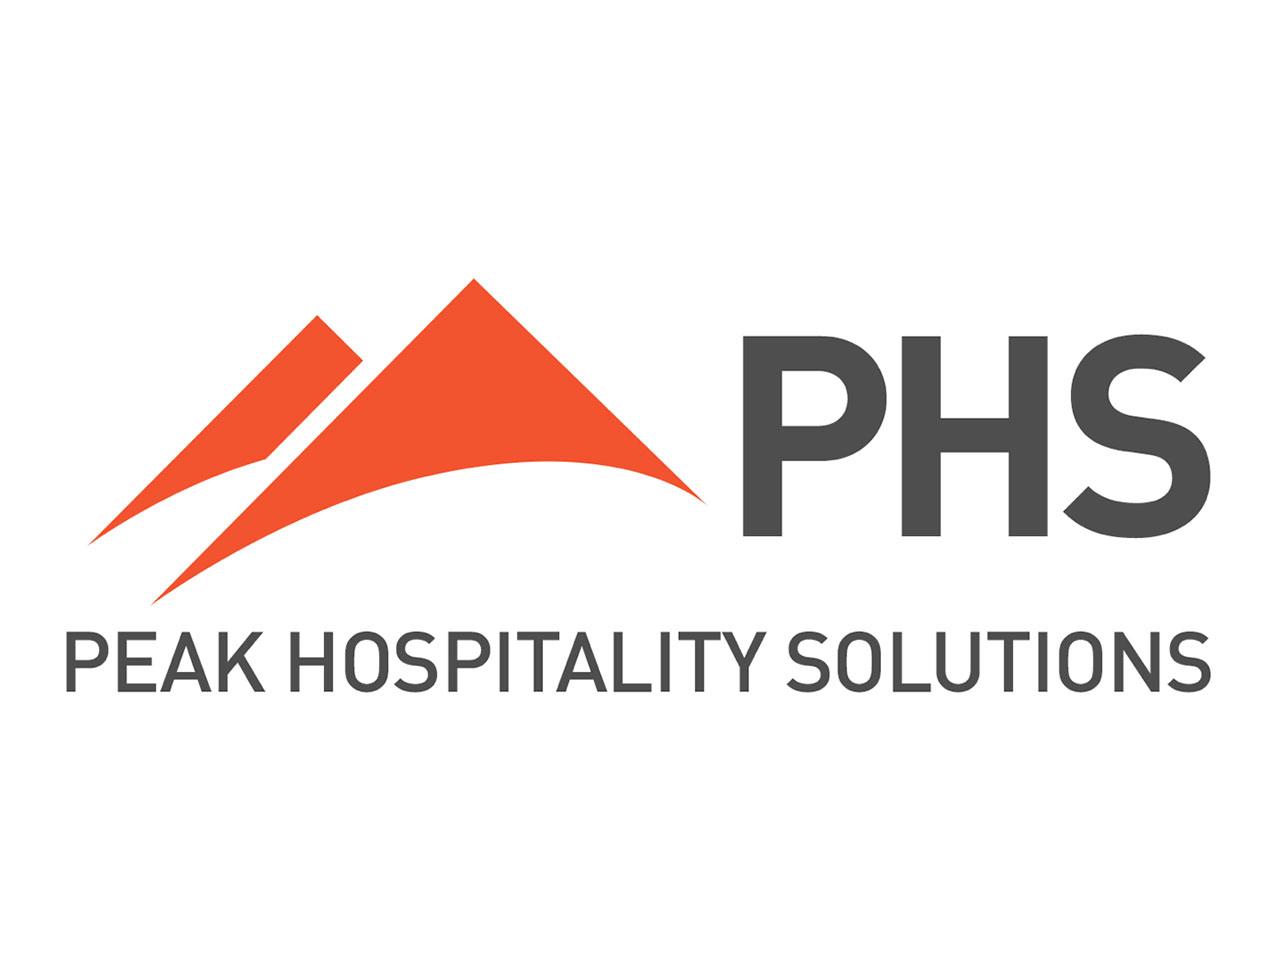 Peak Hospitality Solutions